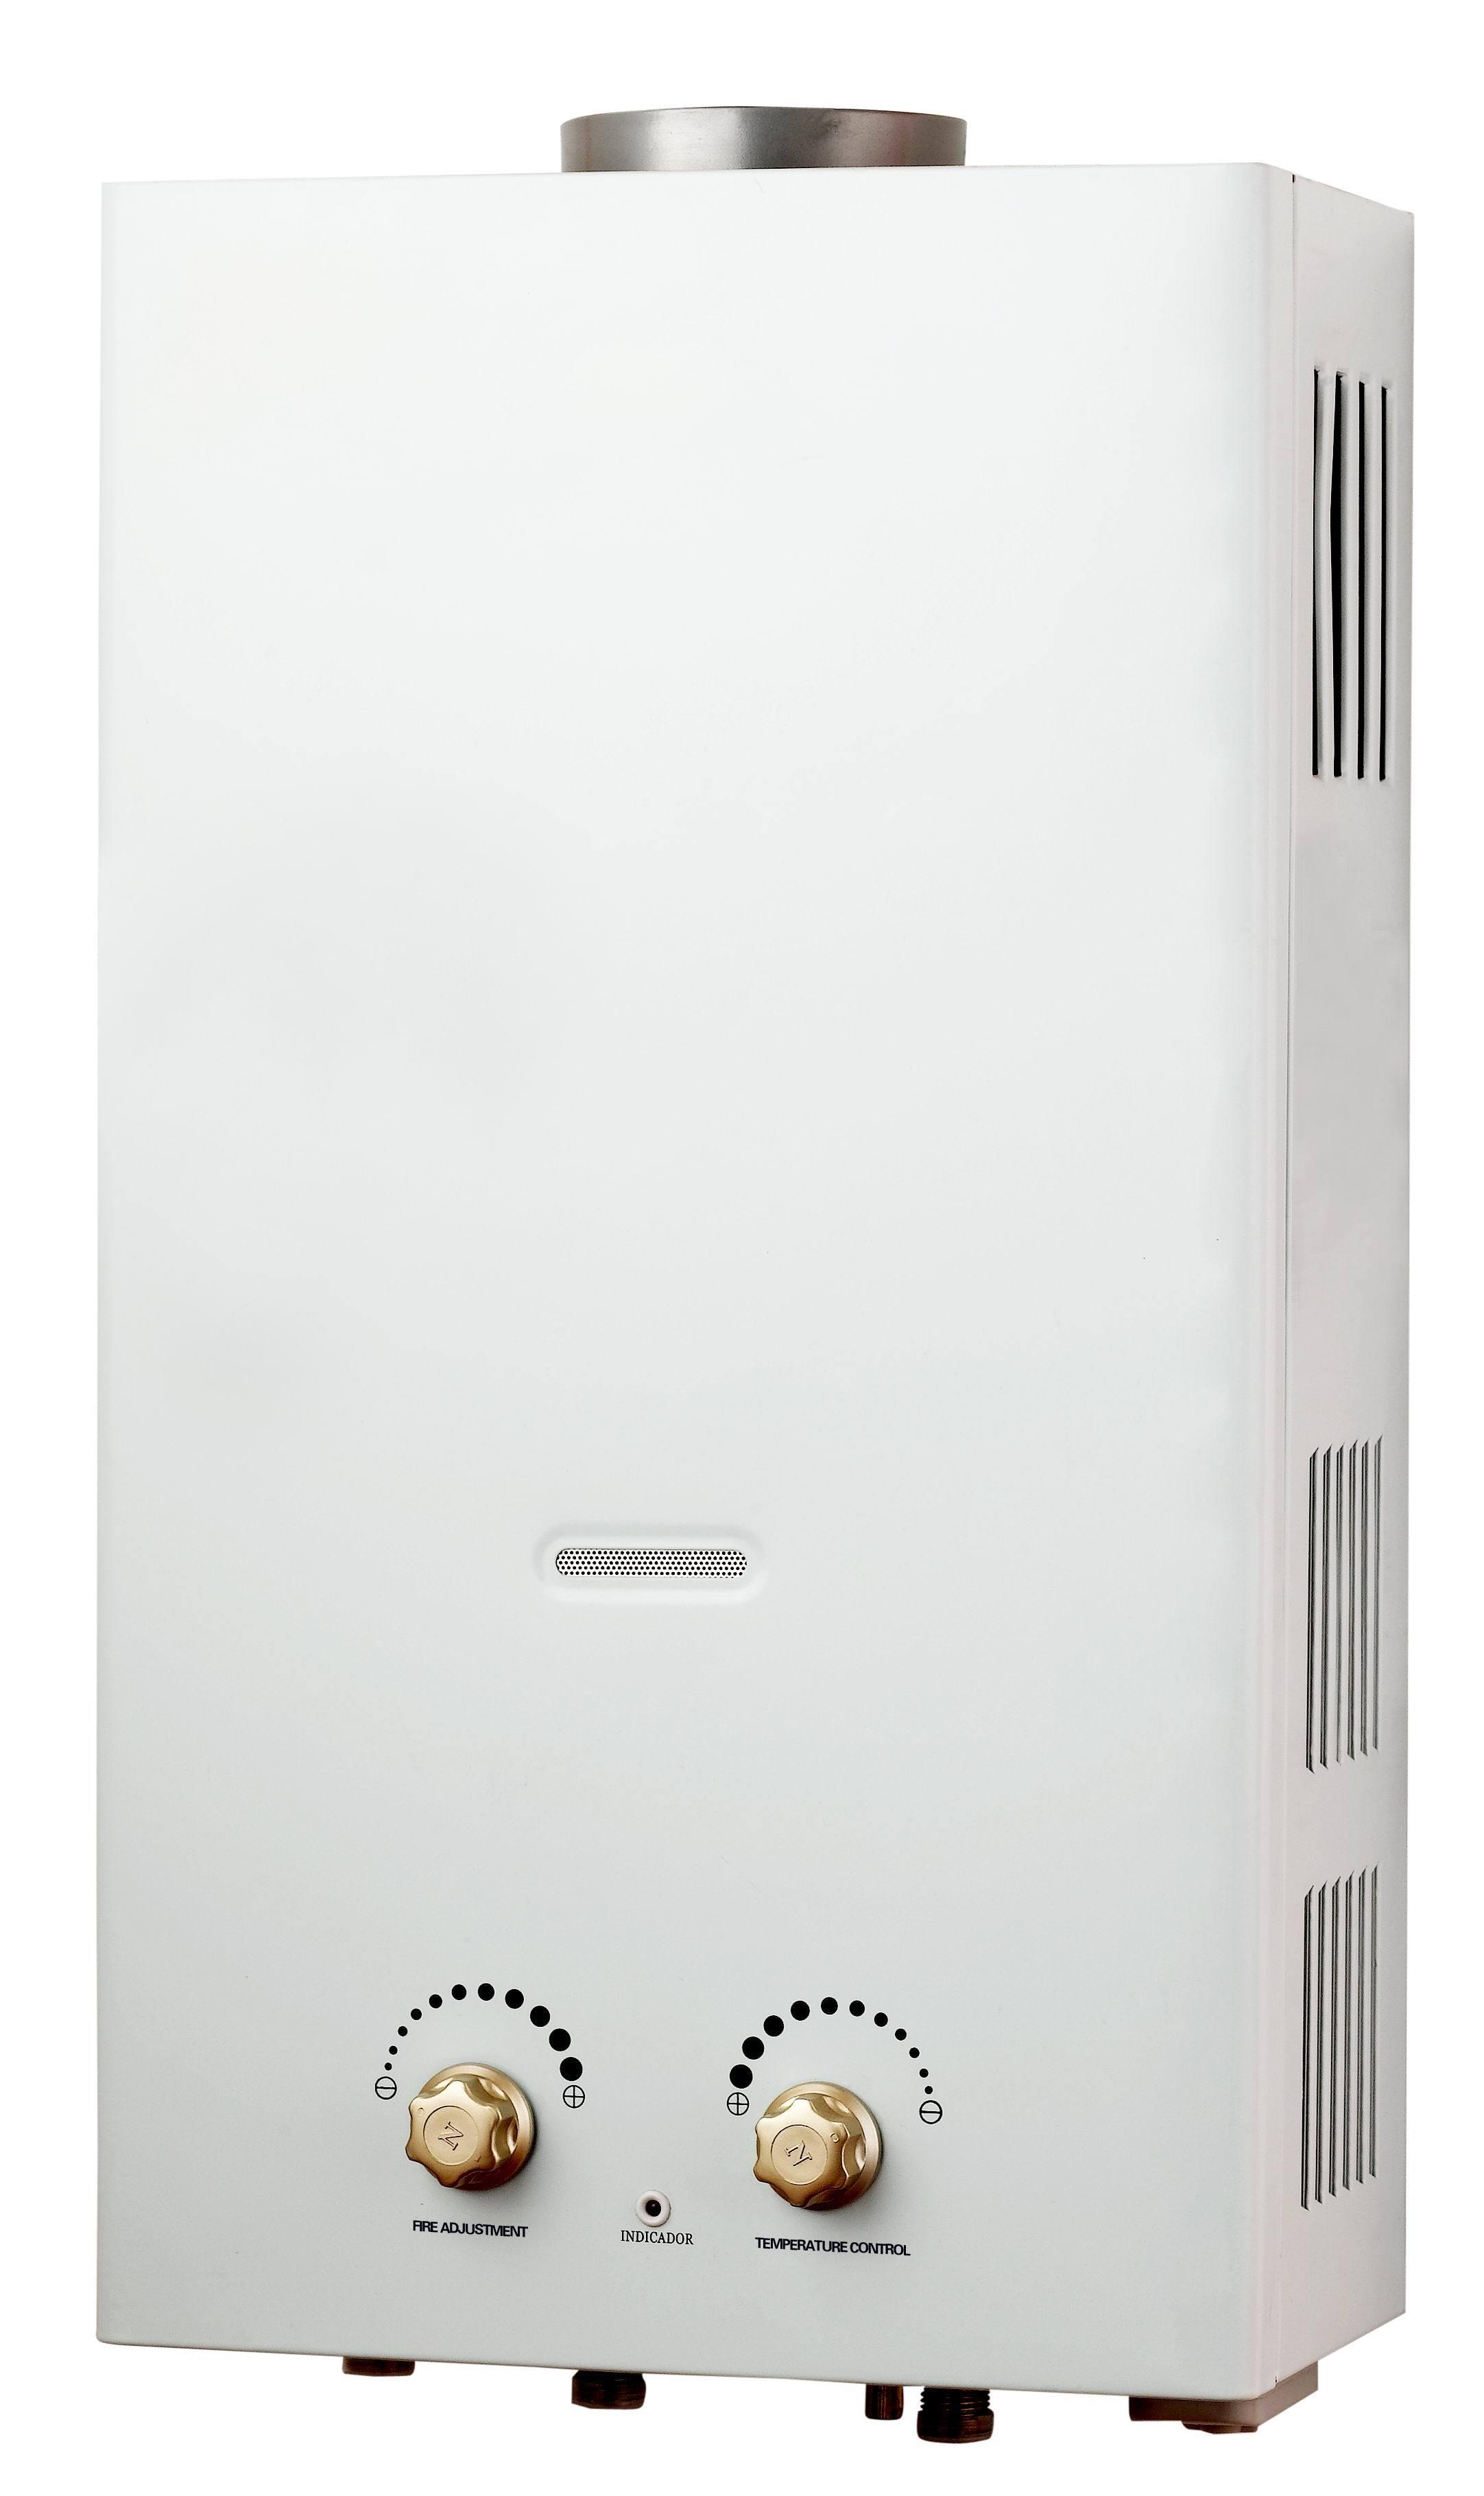 12l gas calentador de agua tipo humos wm c1209 12l gas - Calentador de agua precios ...